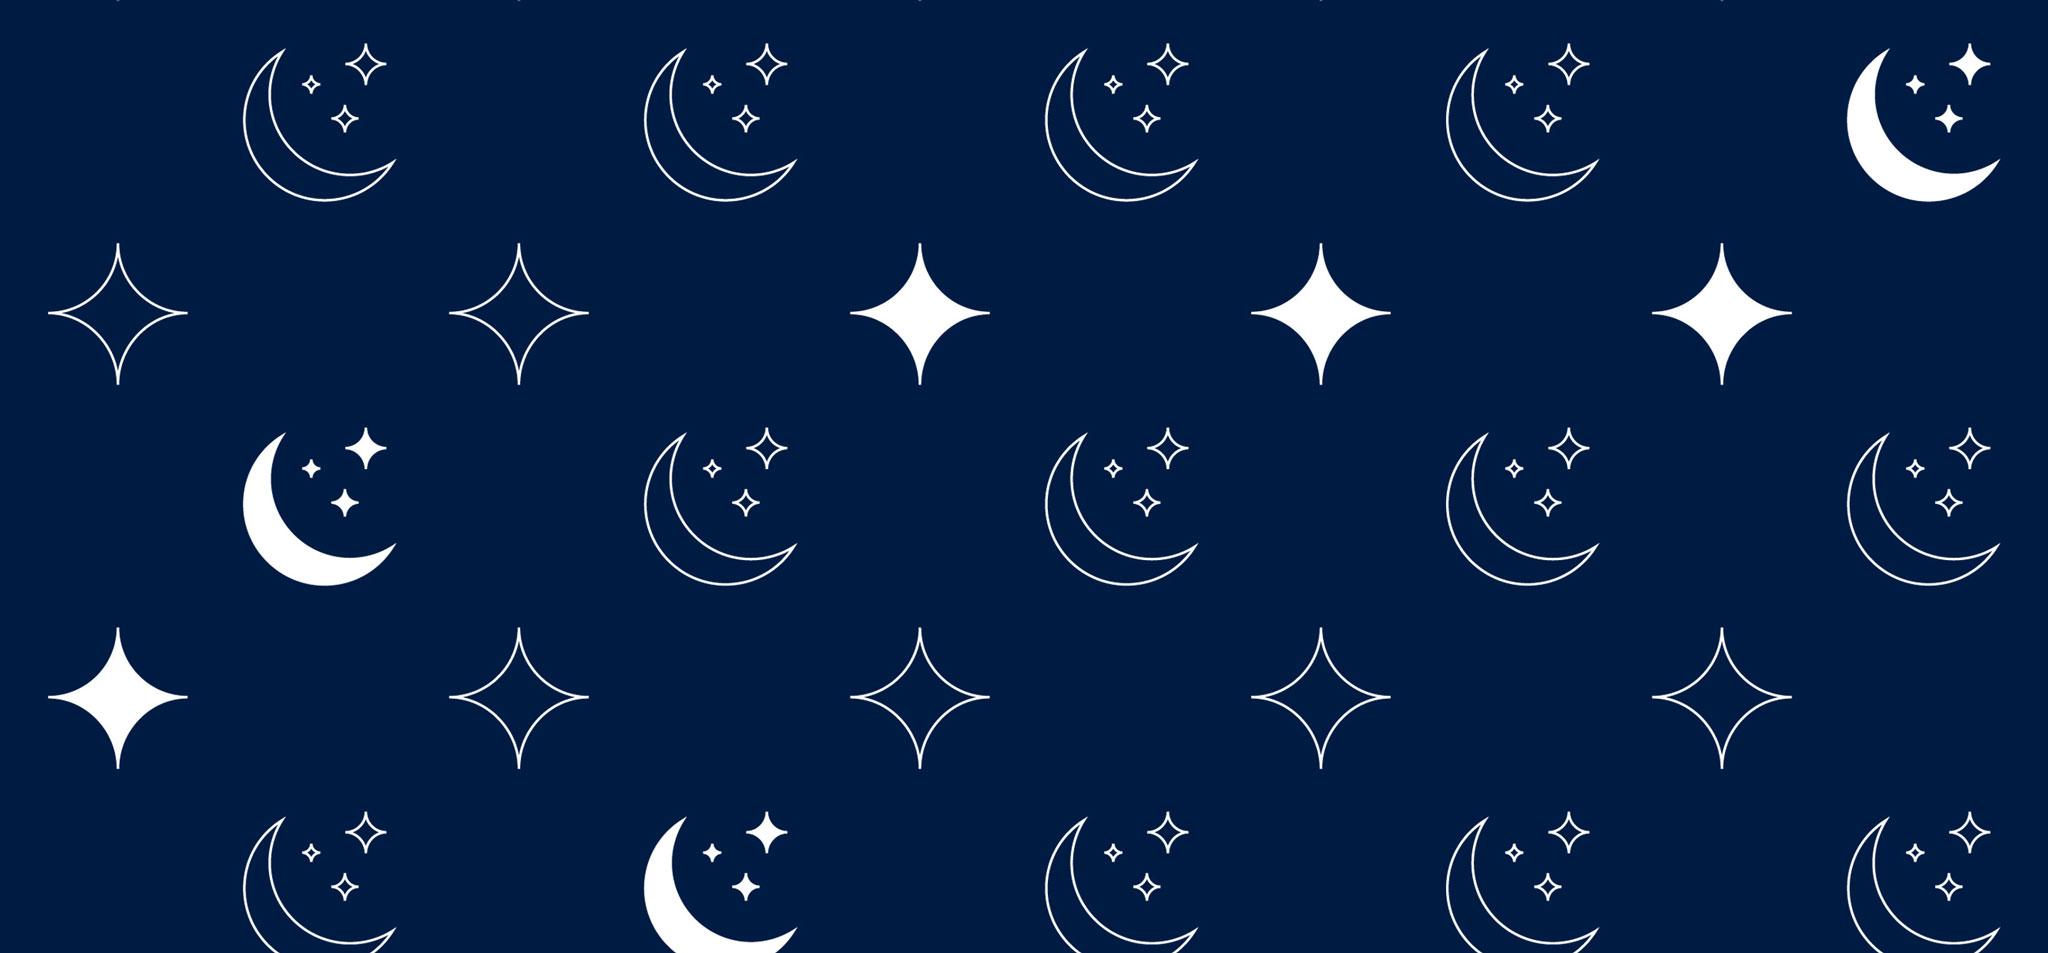 Sleep ailment pattern